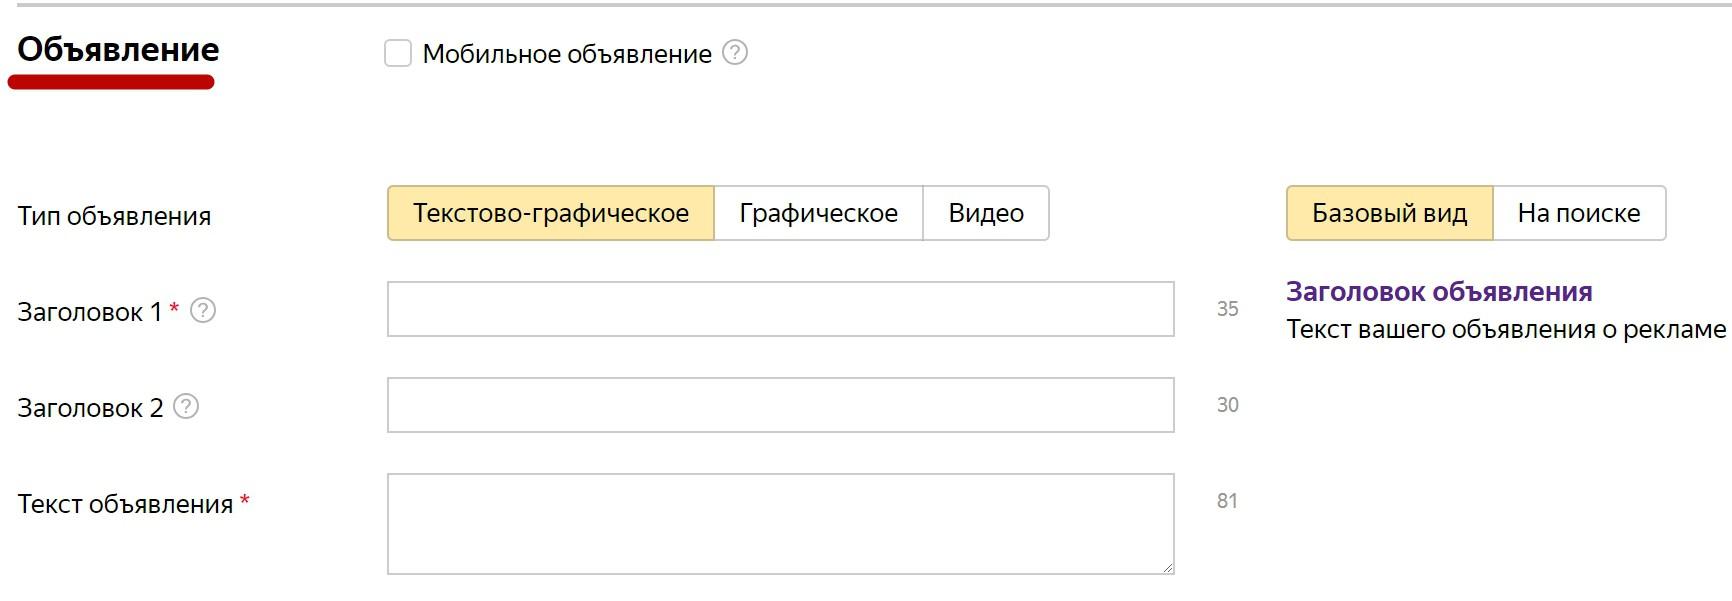 Реклама на поиске Яндекса – пустой шаблон нового объявления